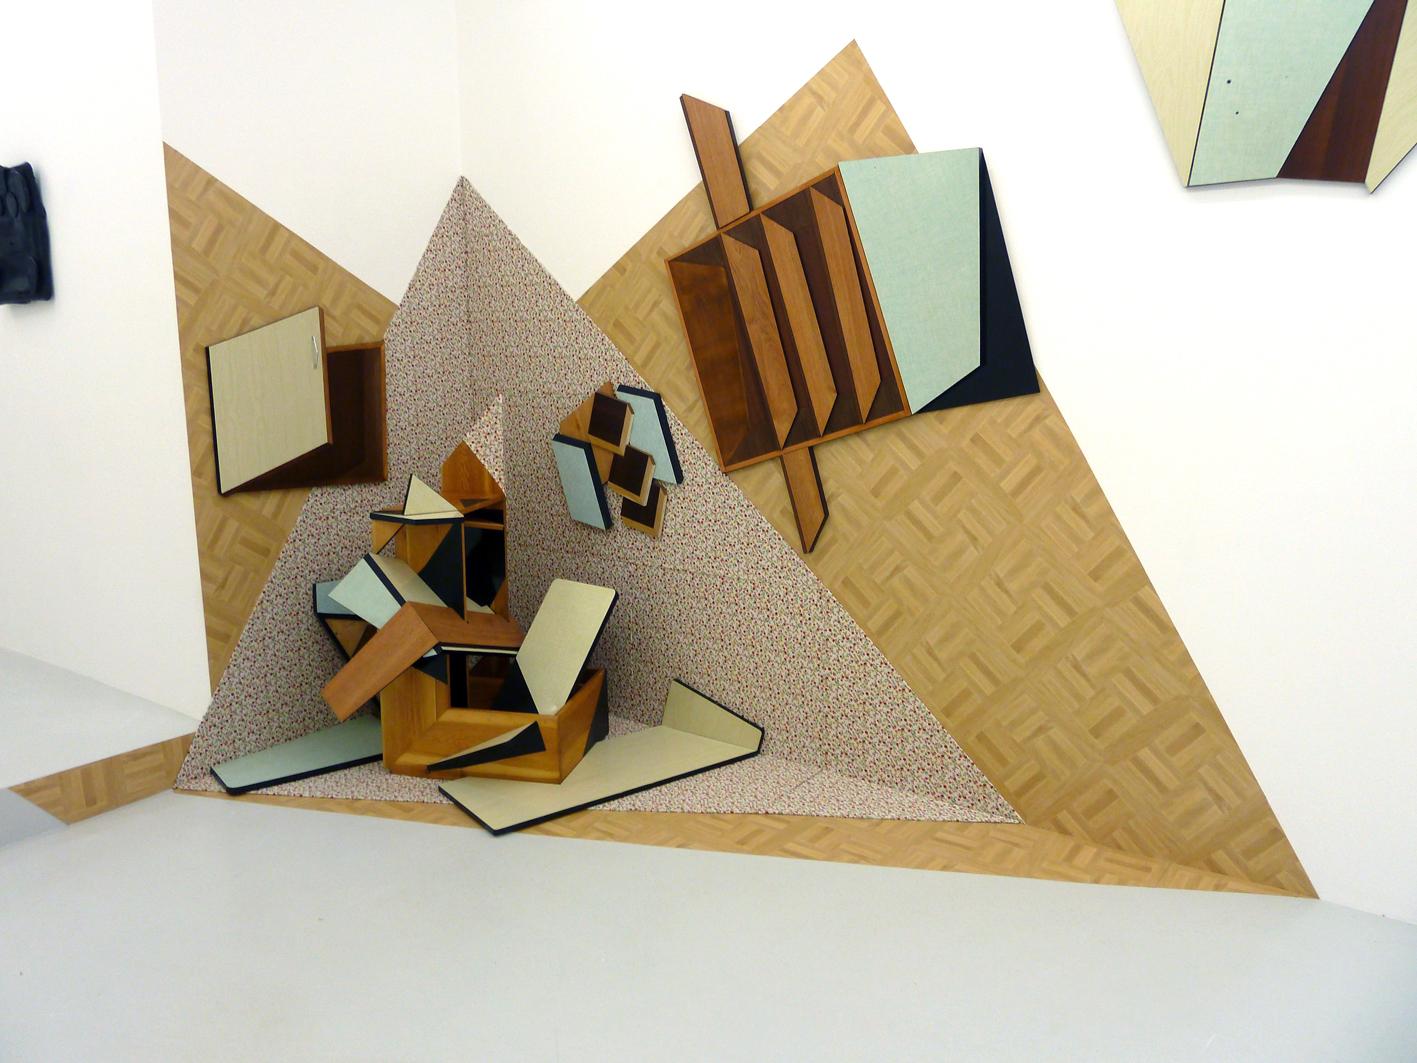 The split corner: Formica furniture, linoleum, wallpaper, wood,chair, table, installation in situ.325x195x125 cm